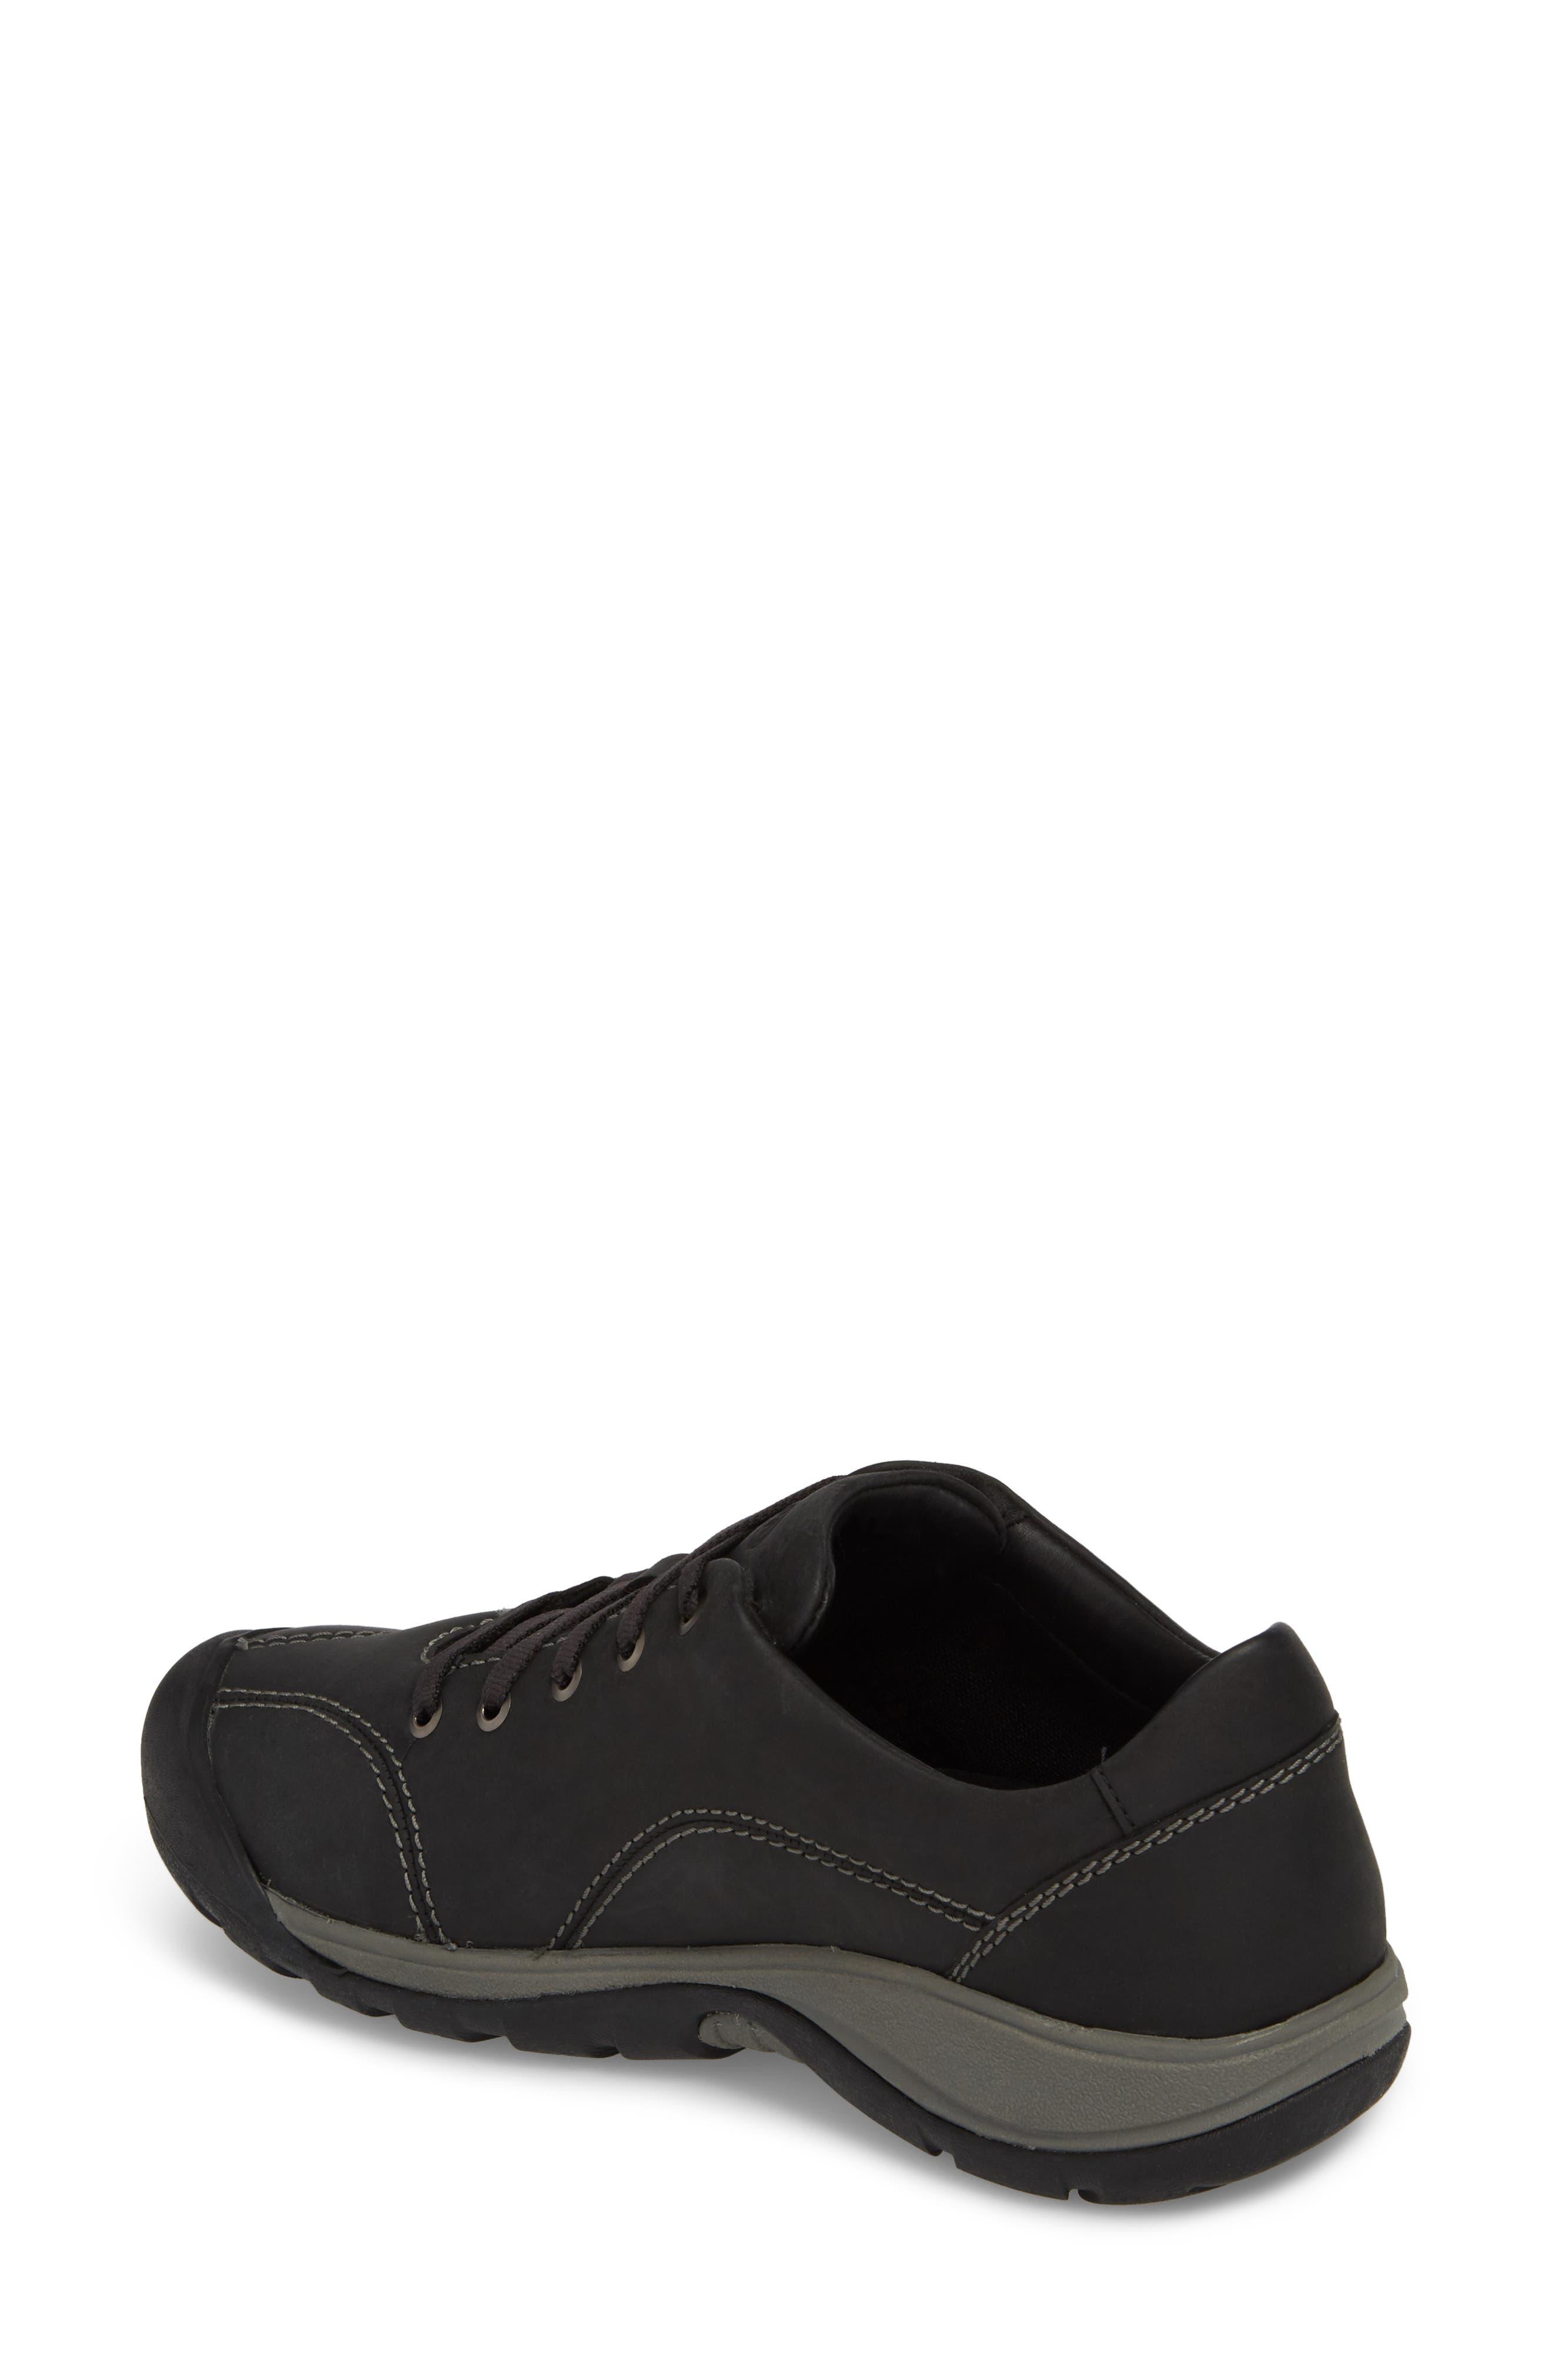 Presidio II Sneaker,                             Alternate thumbnail 2, color,                             BLACK/ STEEL GREY LEATHER